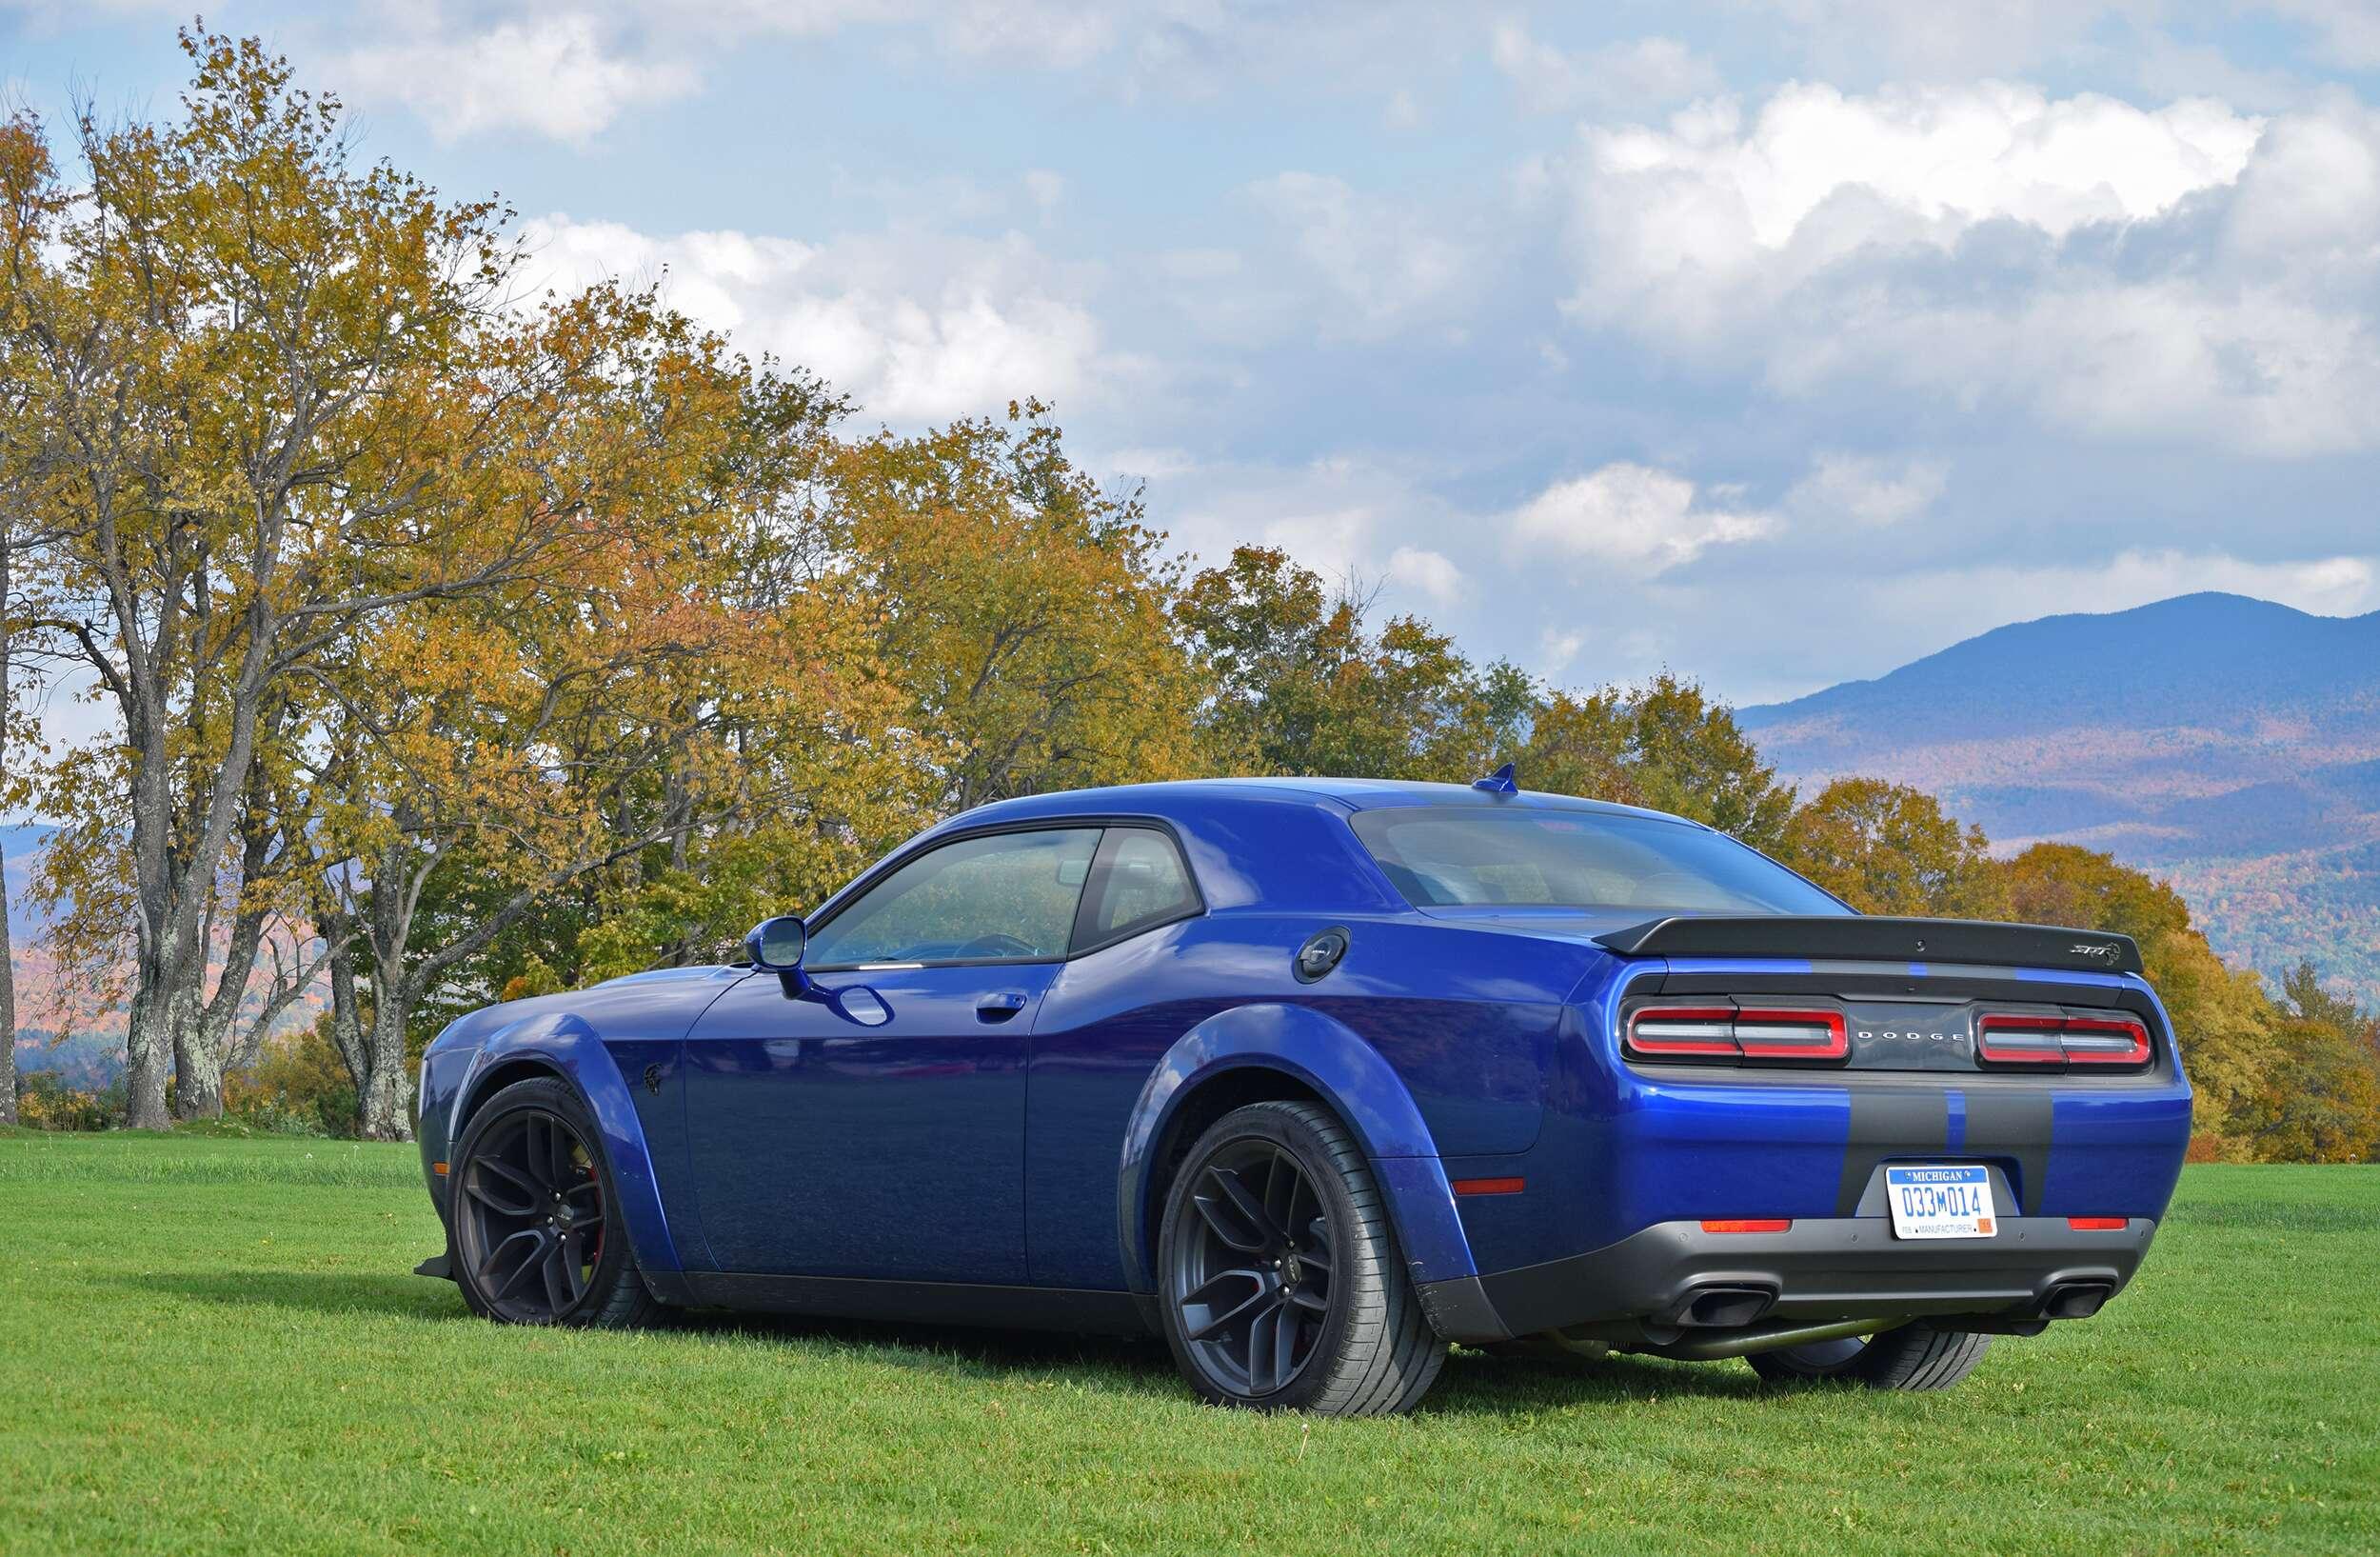 2019 Dodge Challenger Srt Hellcat Redeye Test Drive Review The Jack